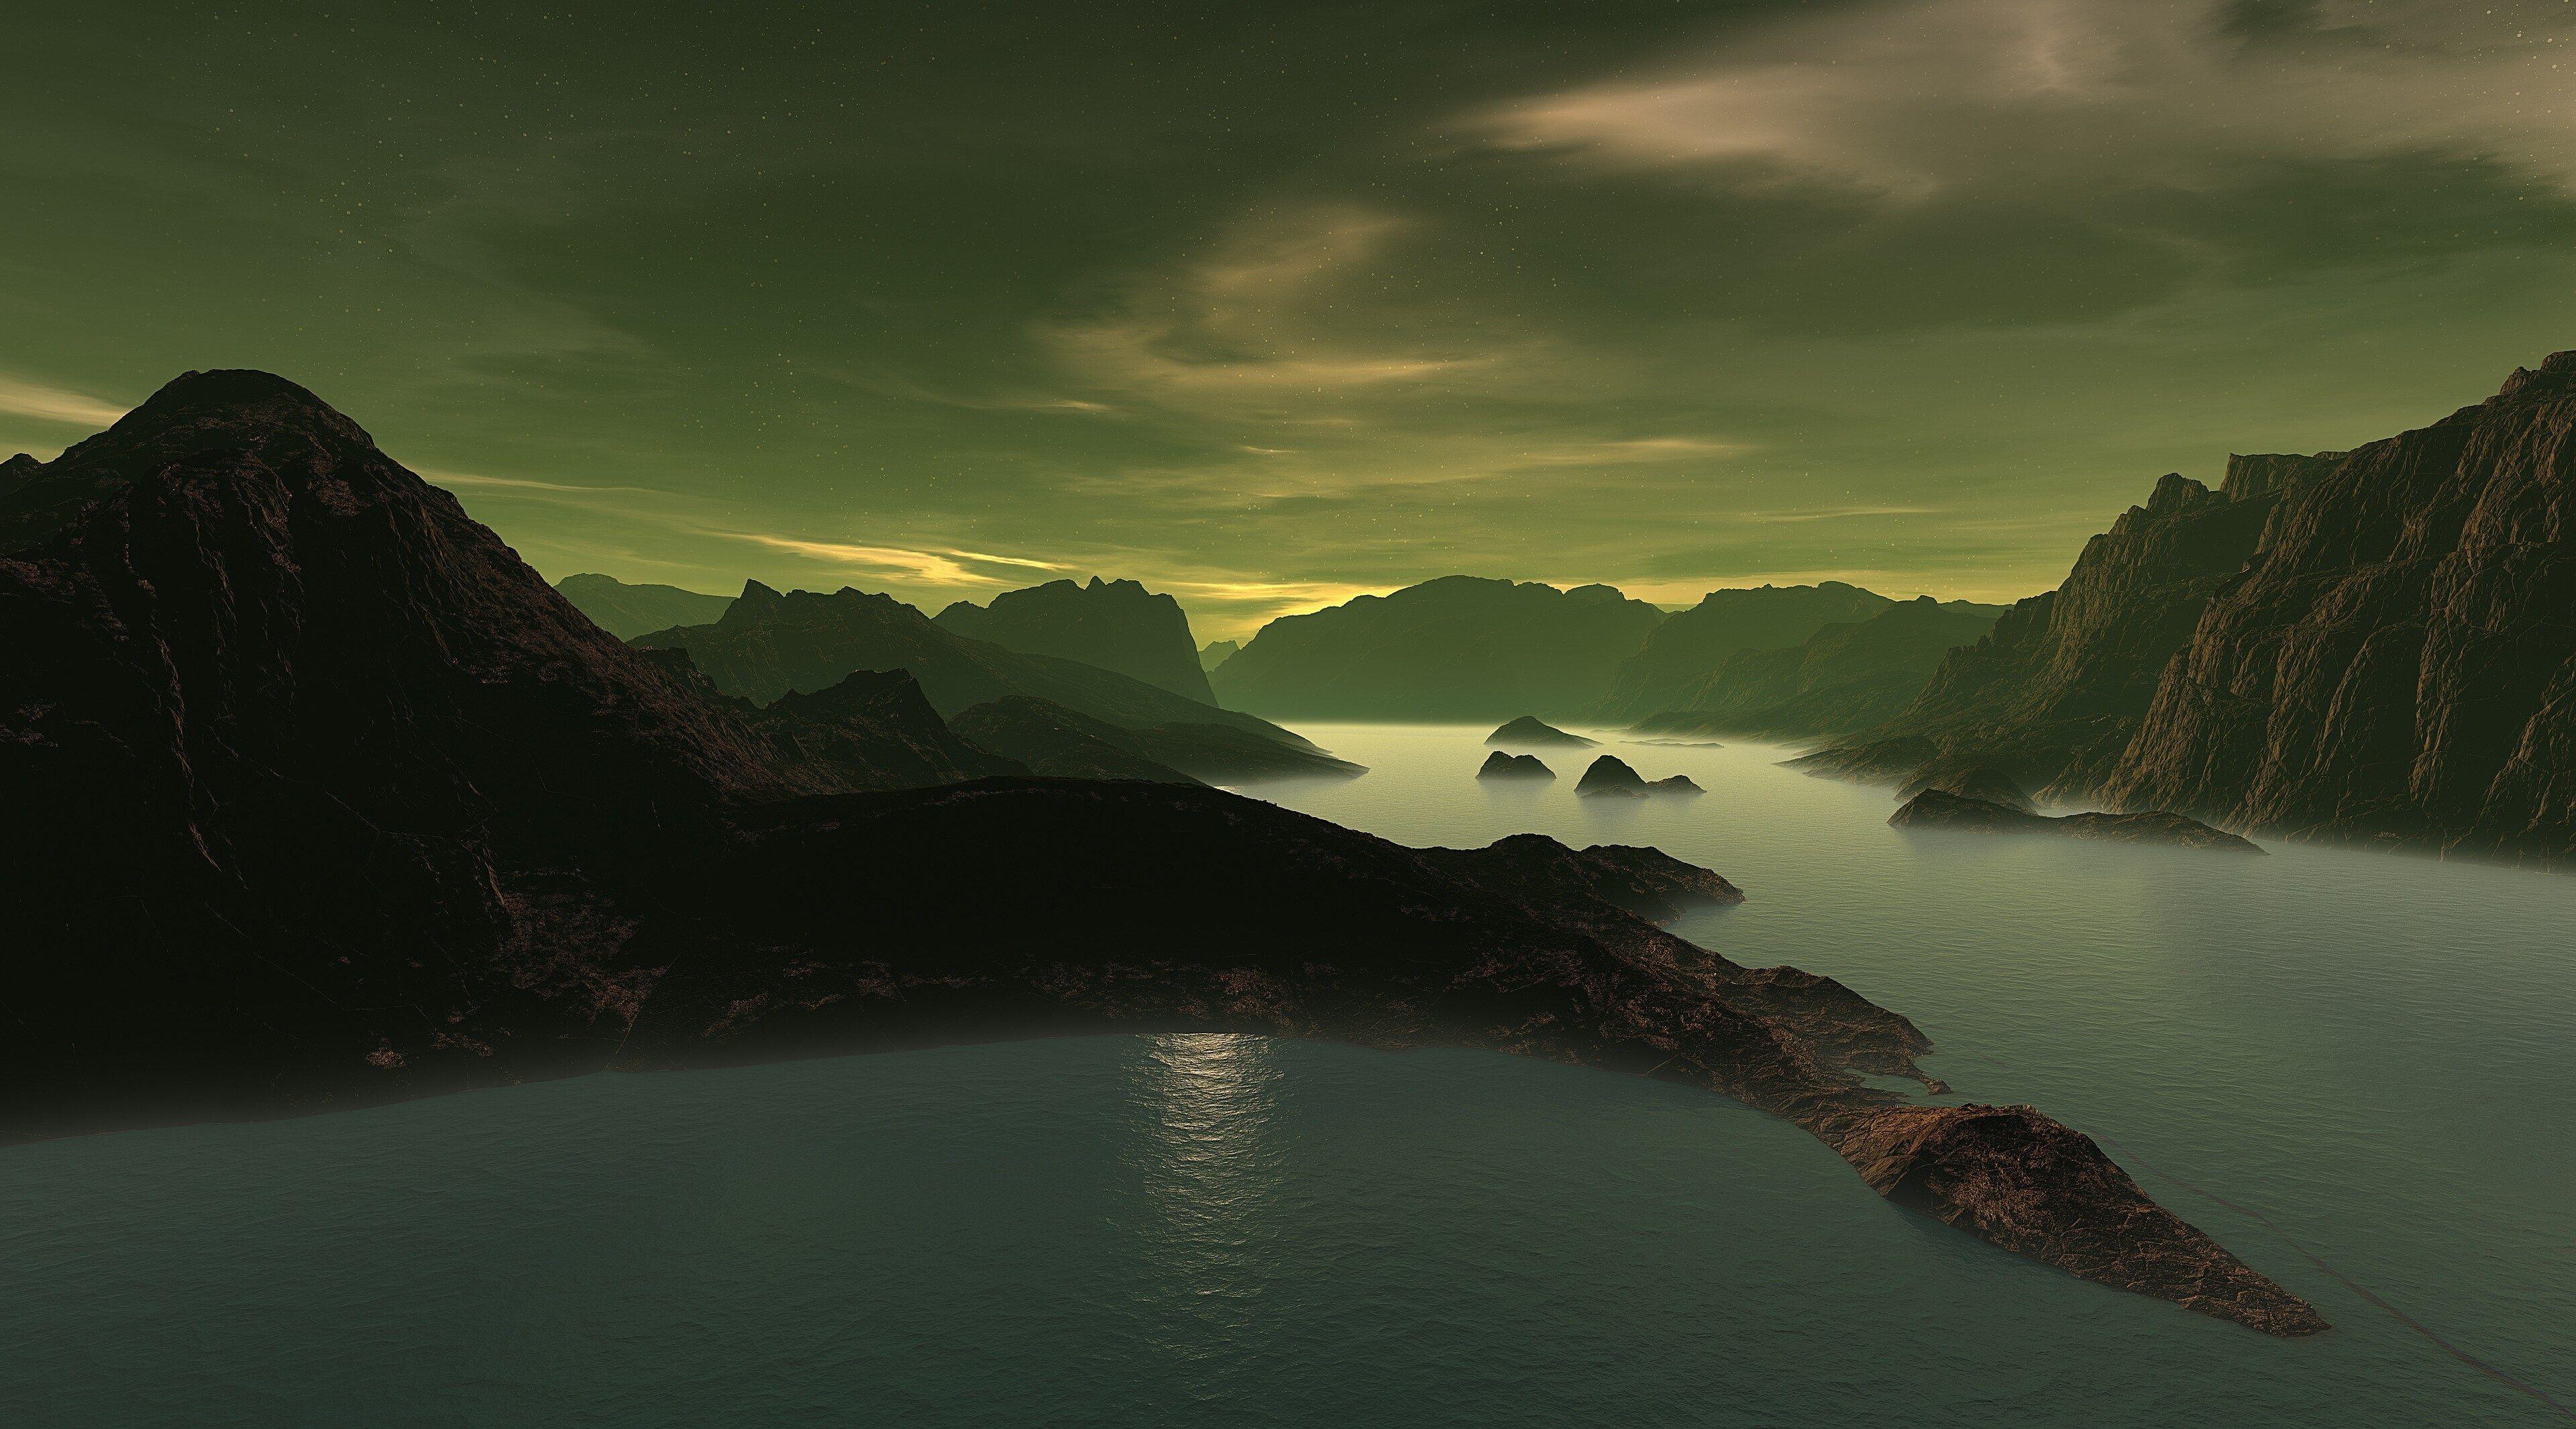 3840x2130 3d 4k Free Wallpaper Background For Computer Hd Landscape Hd Nature Wallpapers Lake Landscape